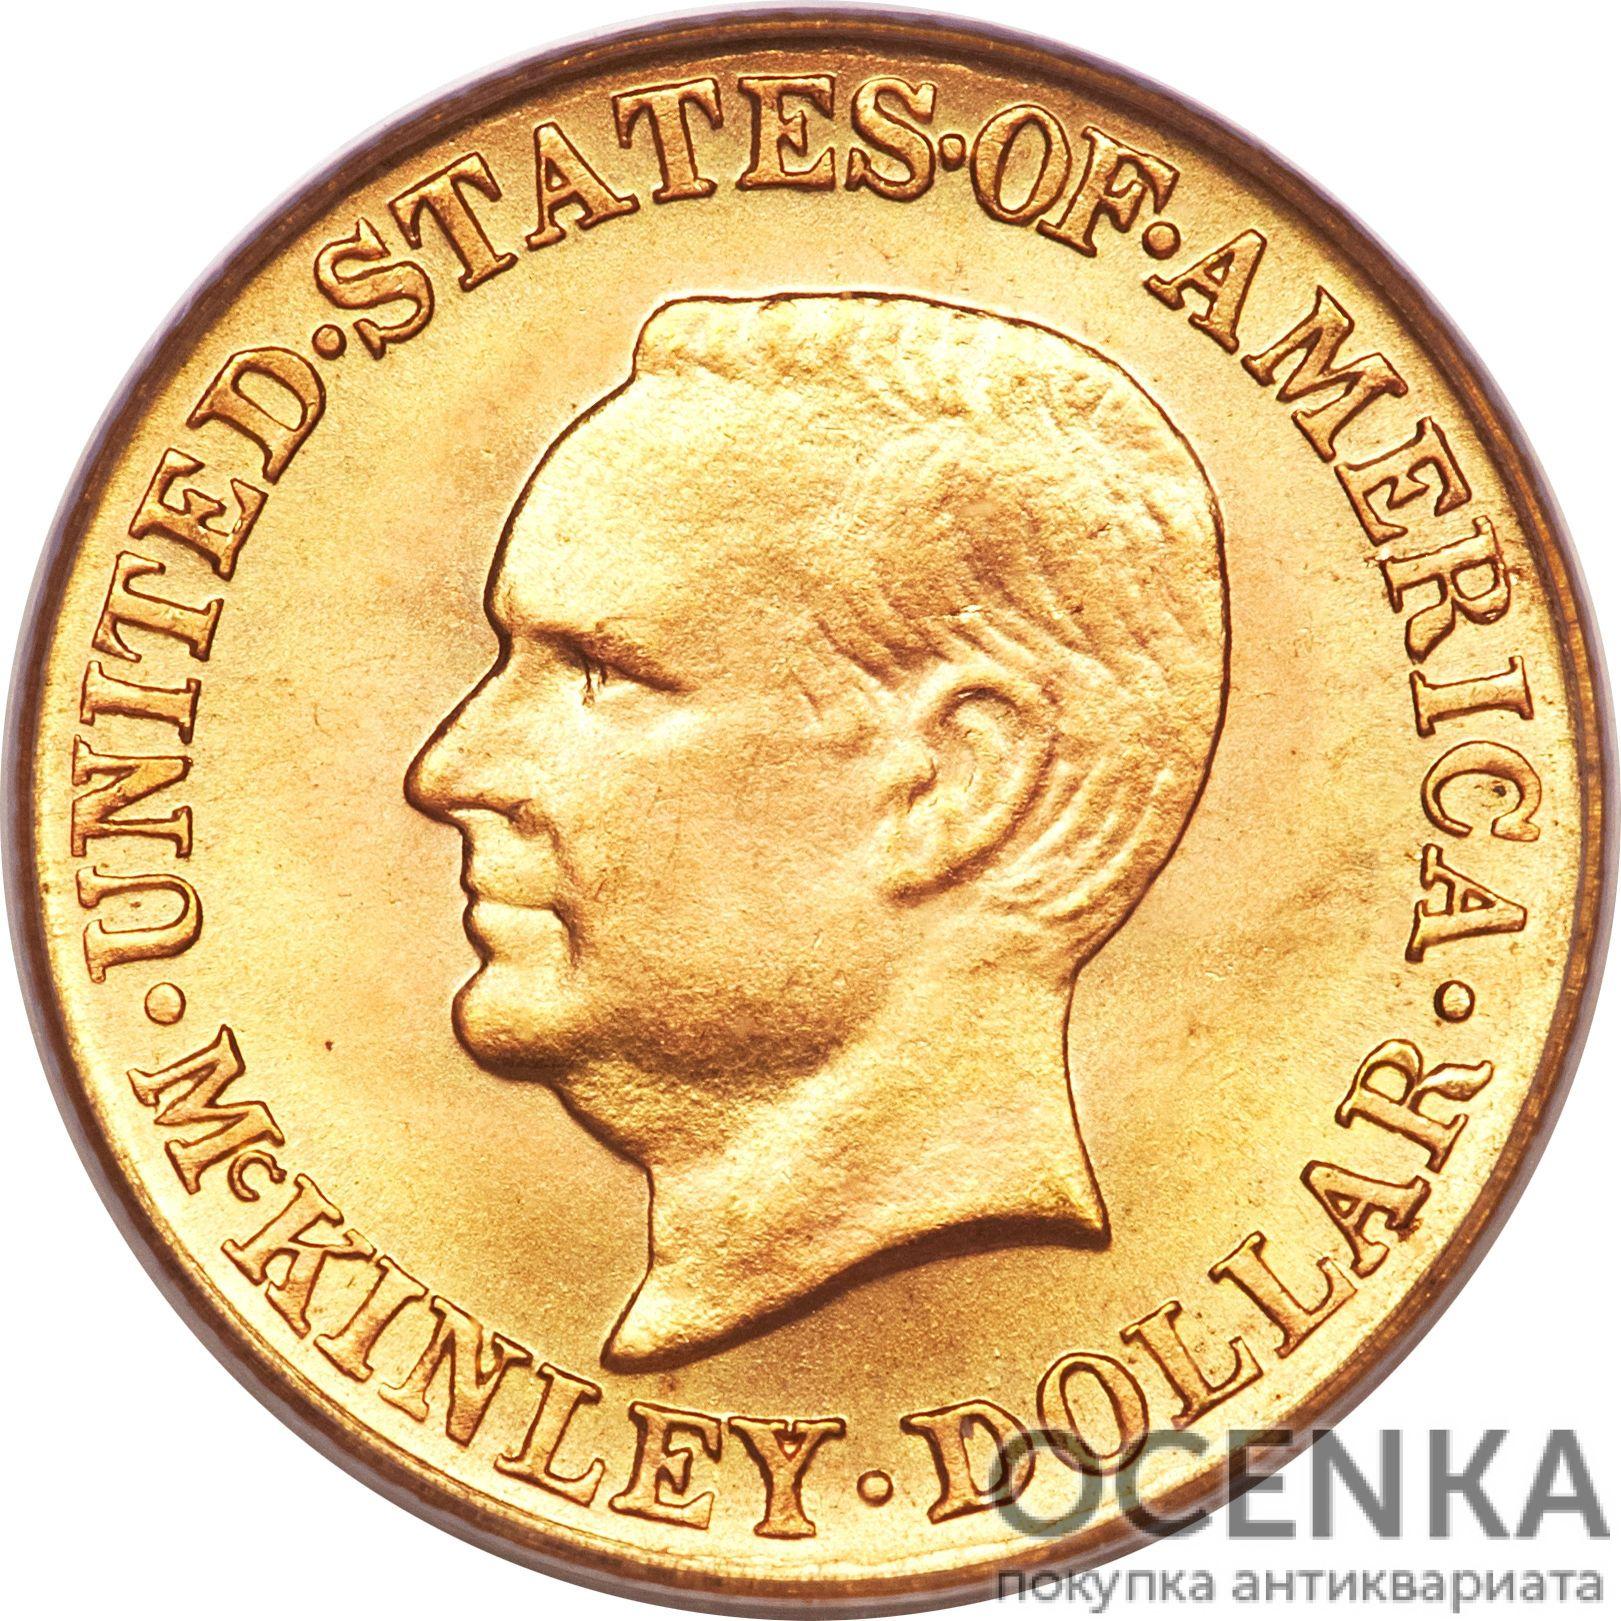 Золотая монета 1 Dollar (доллар) США - 11